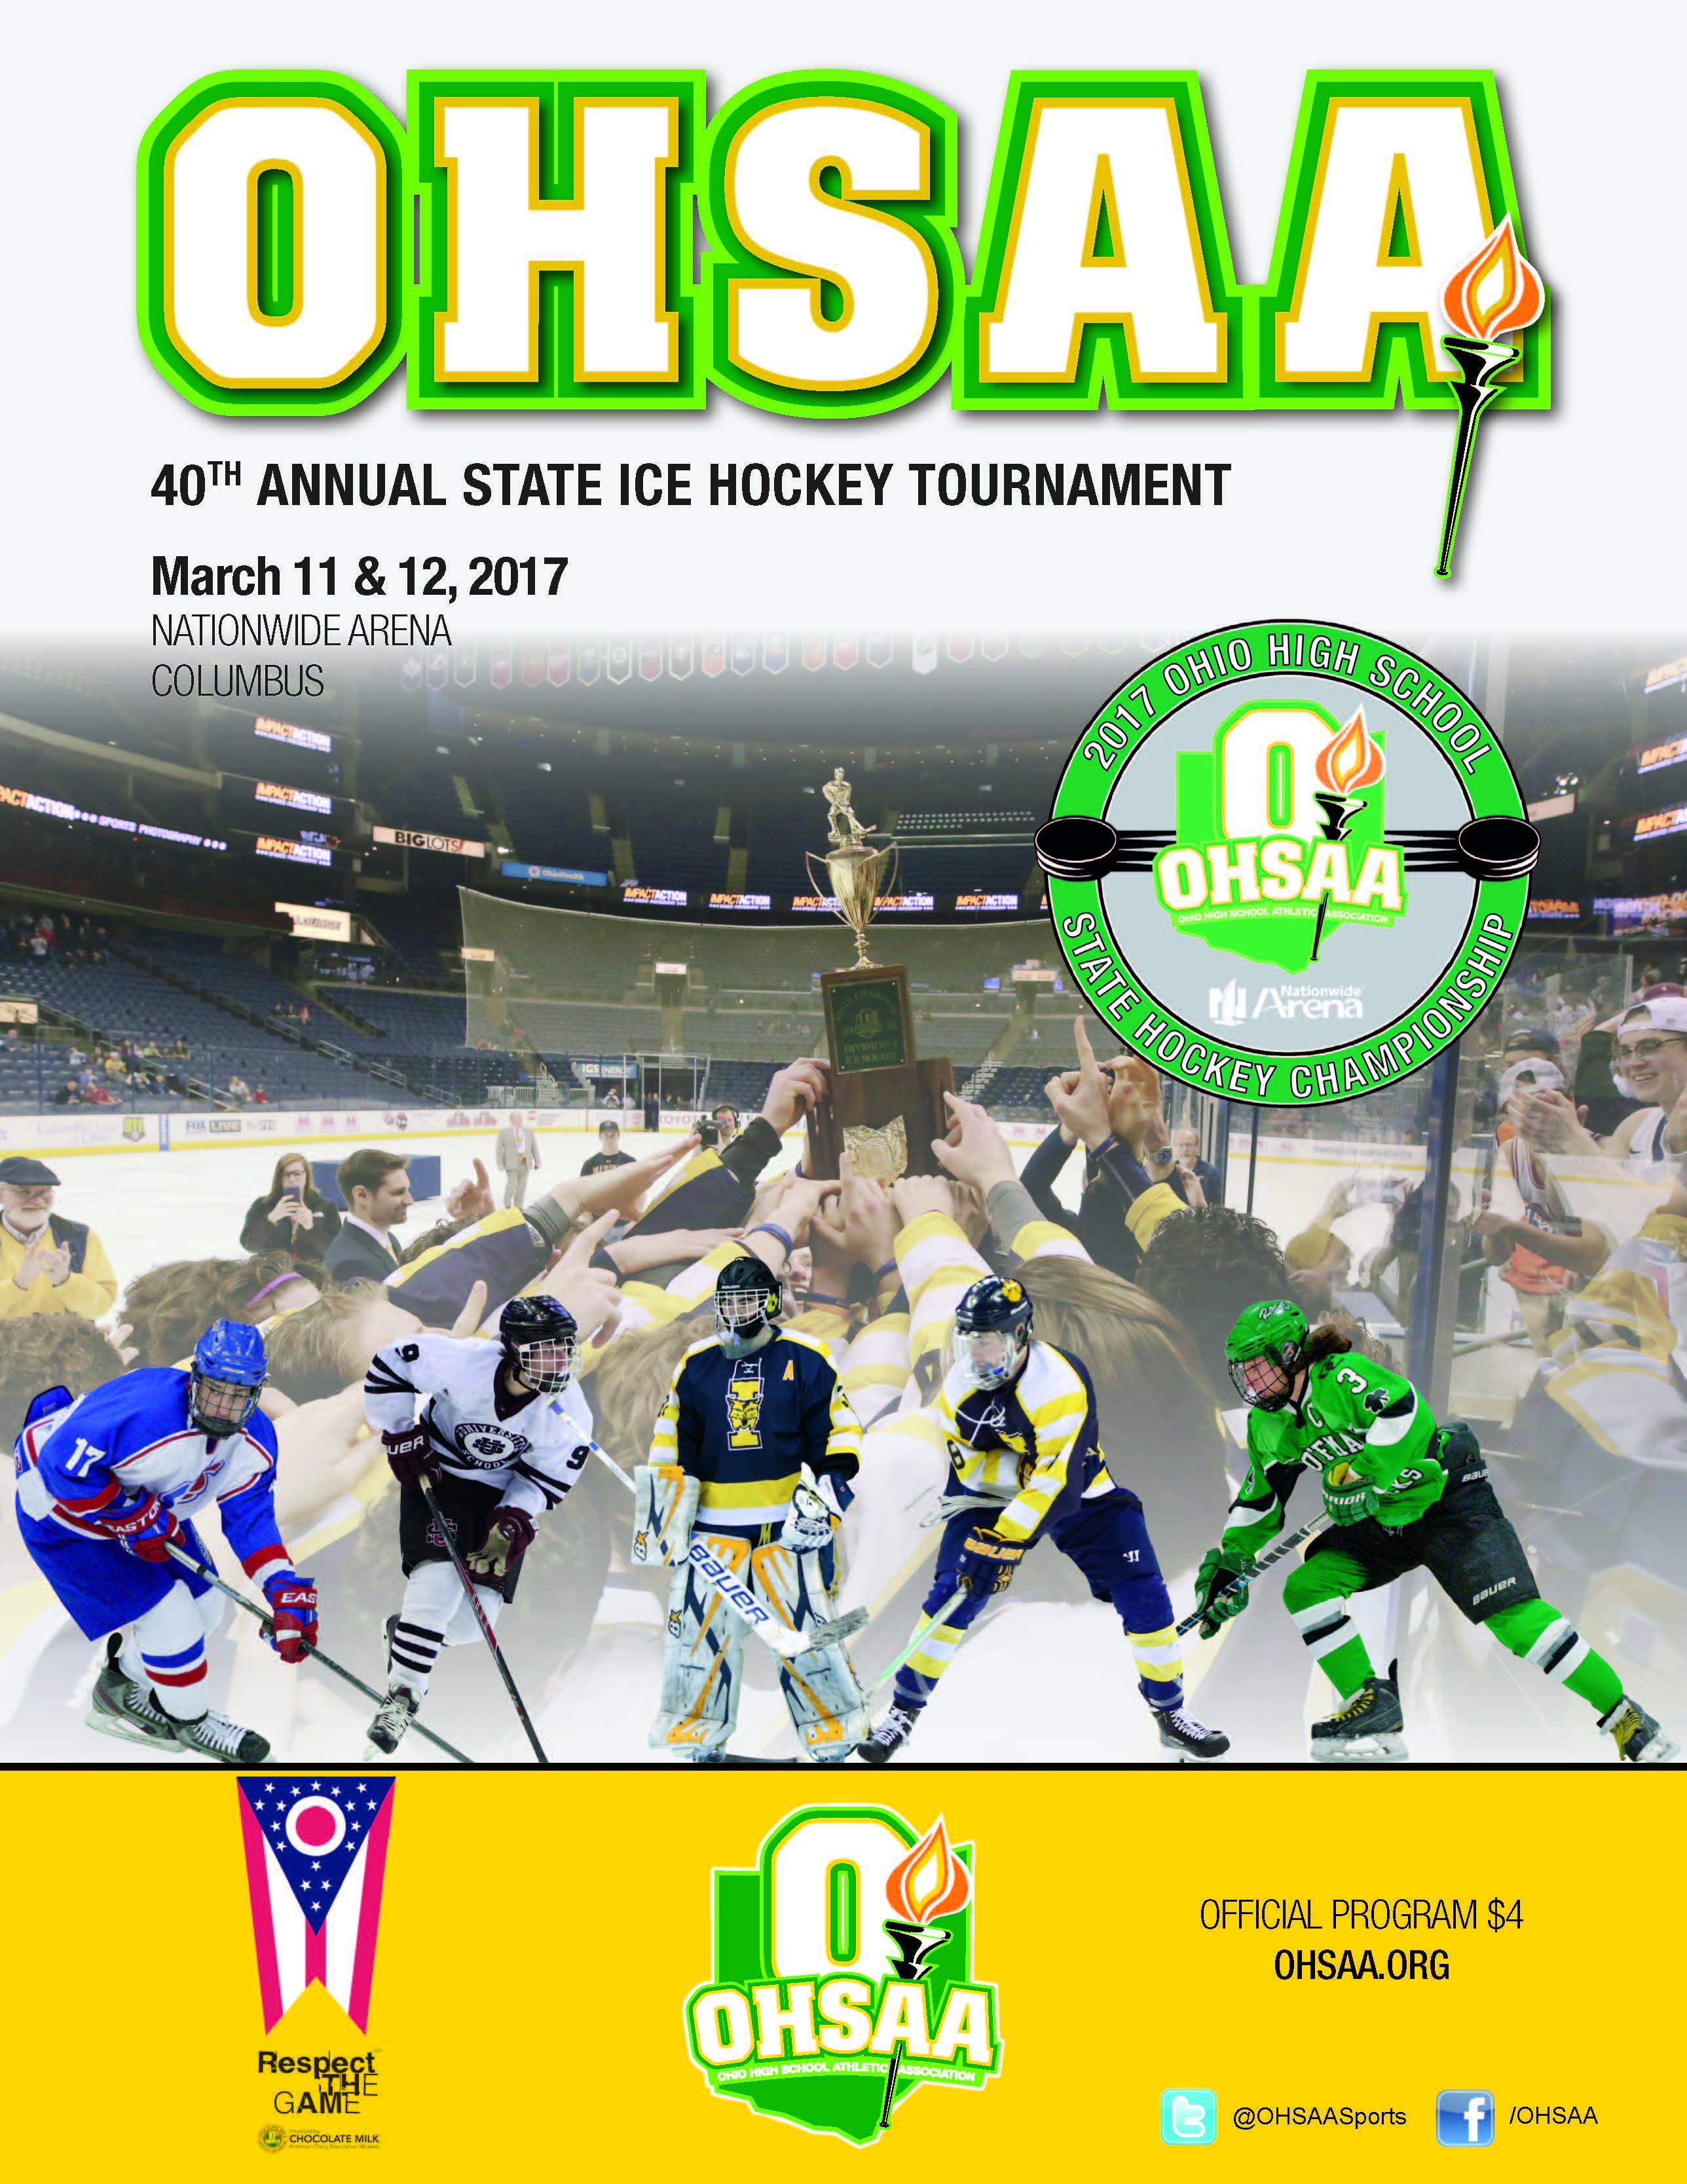 2017 OHSAA Ice Hockey State Tournament Coverage